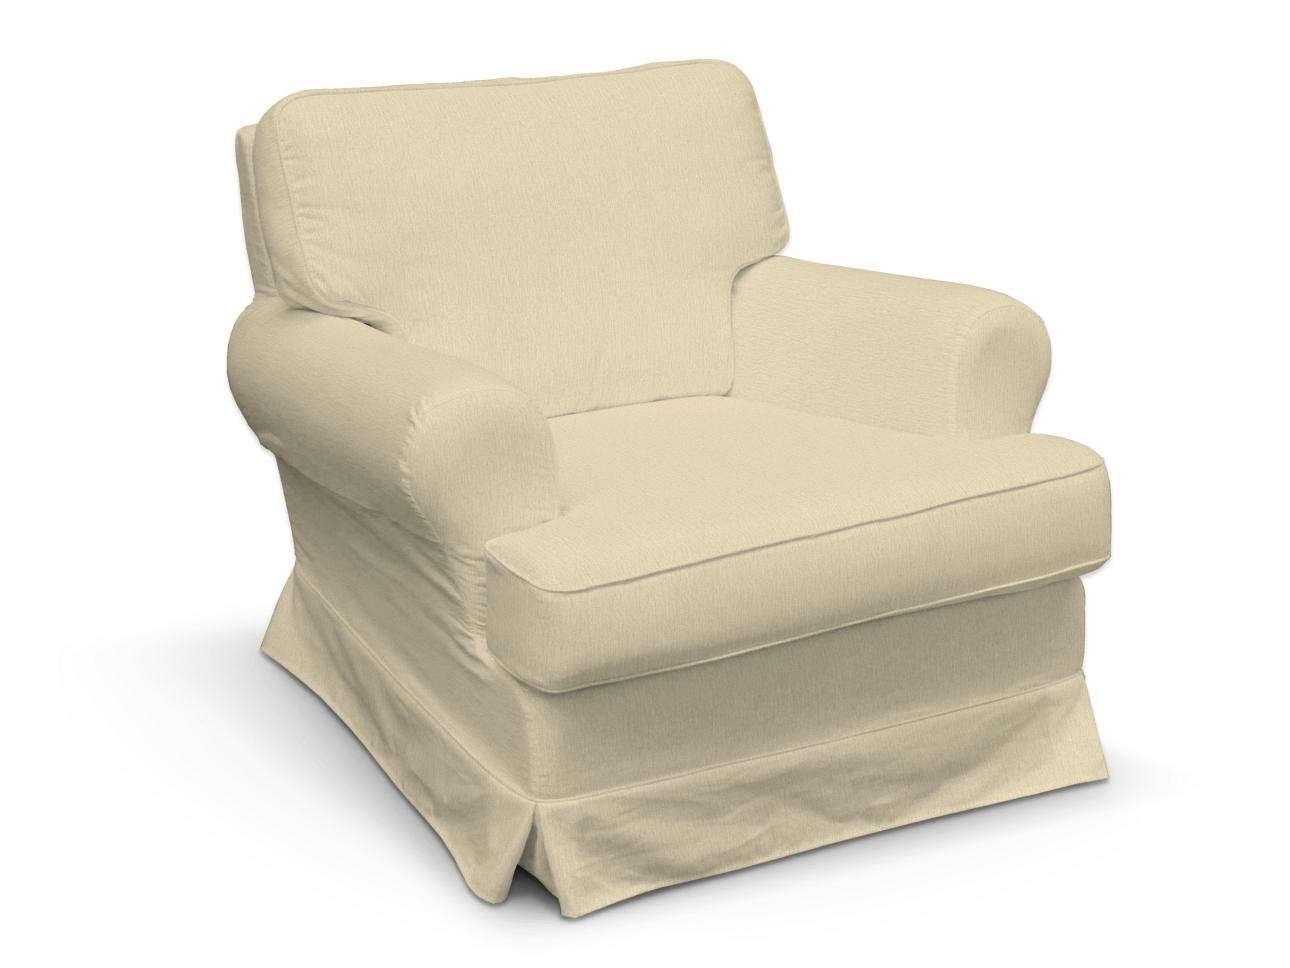 Pokrowiec na fotel Barkaby fotel Barkaby w kolekcji Chenille, tkanina: 702-22